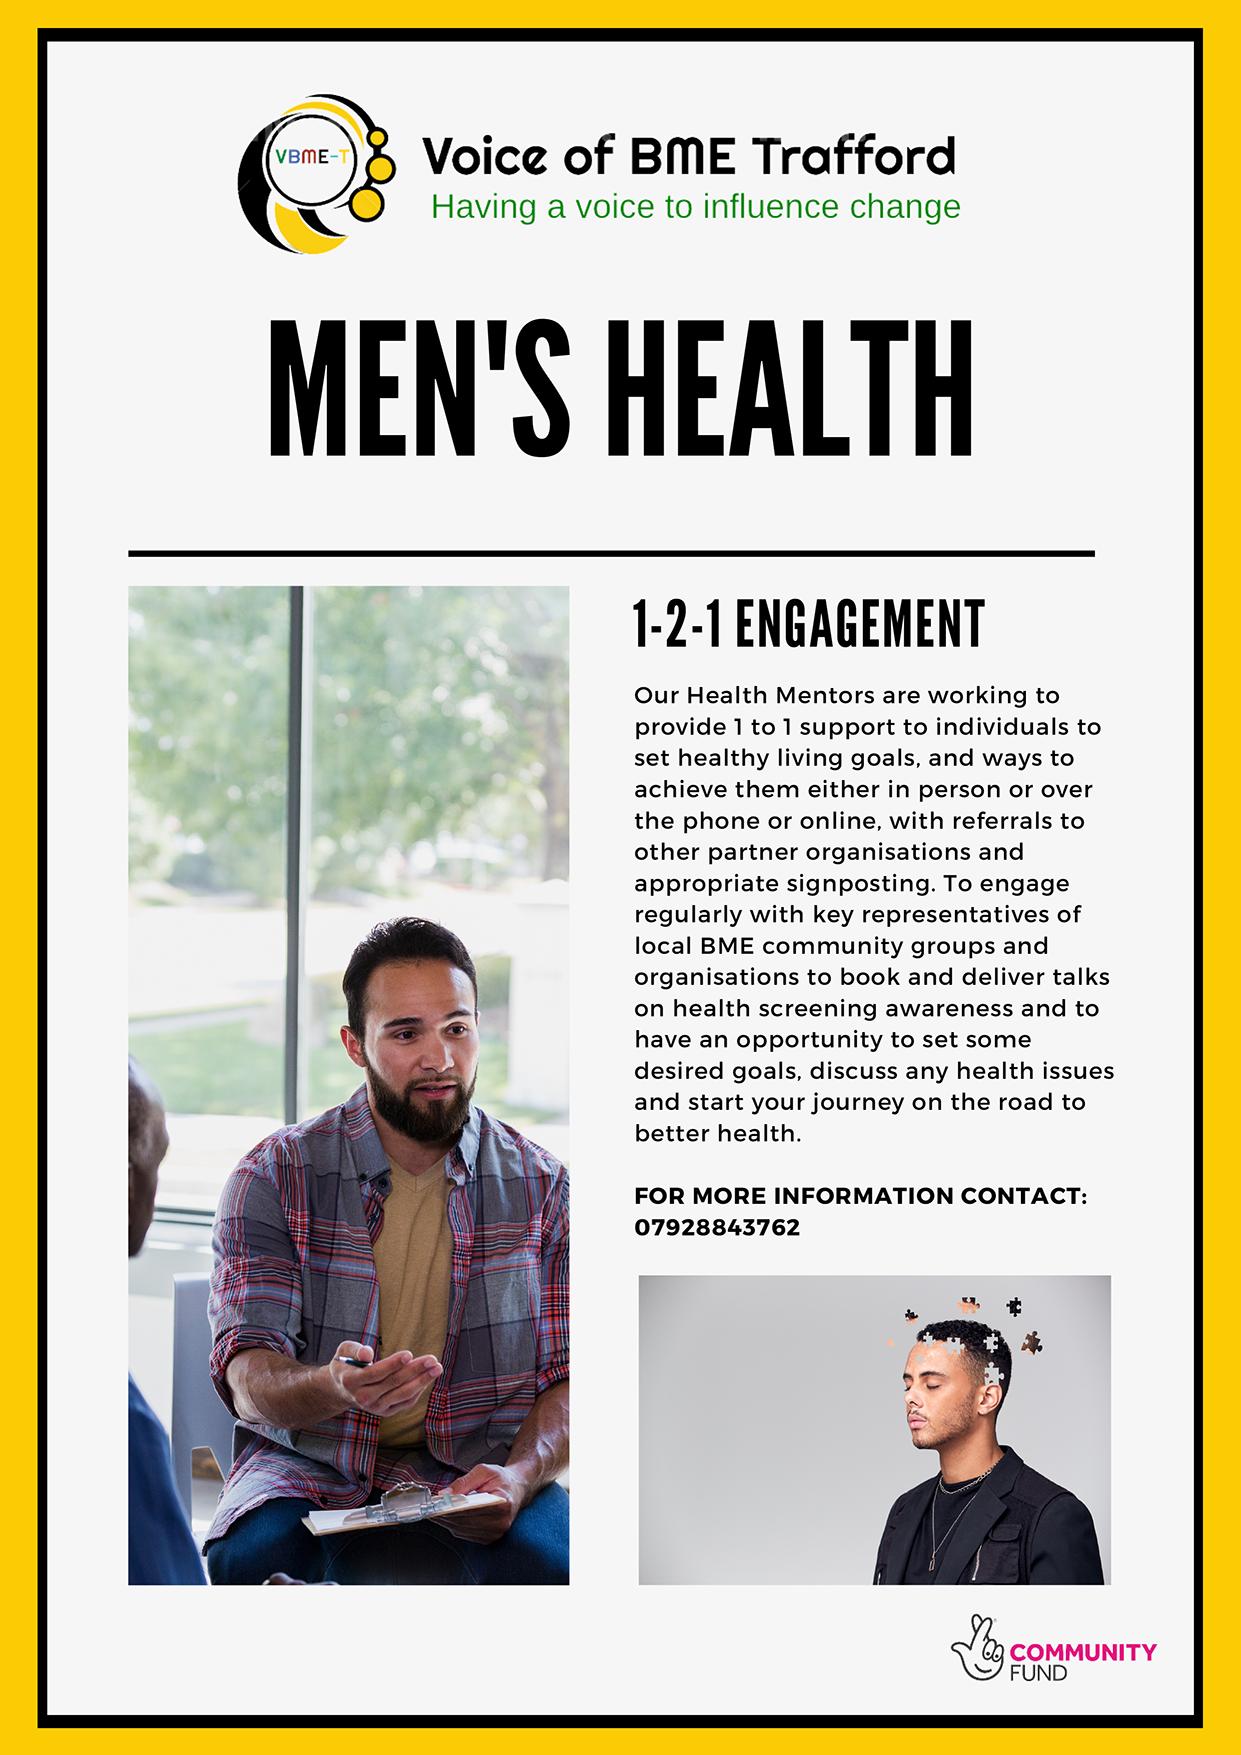 https://voicebmet.co.uk/home/wp-content/uploads/2021/05/VBMET-BROCHURE-Mens-Health-002-2.png